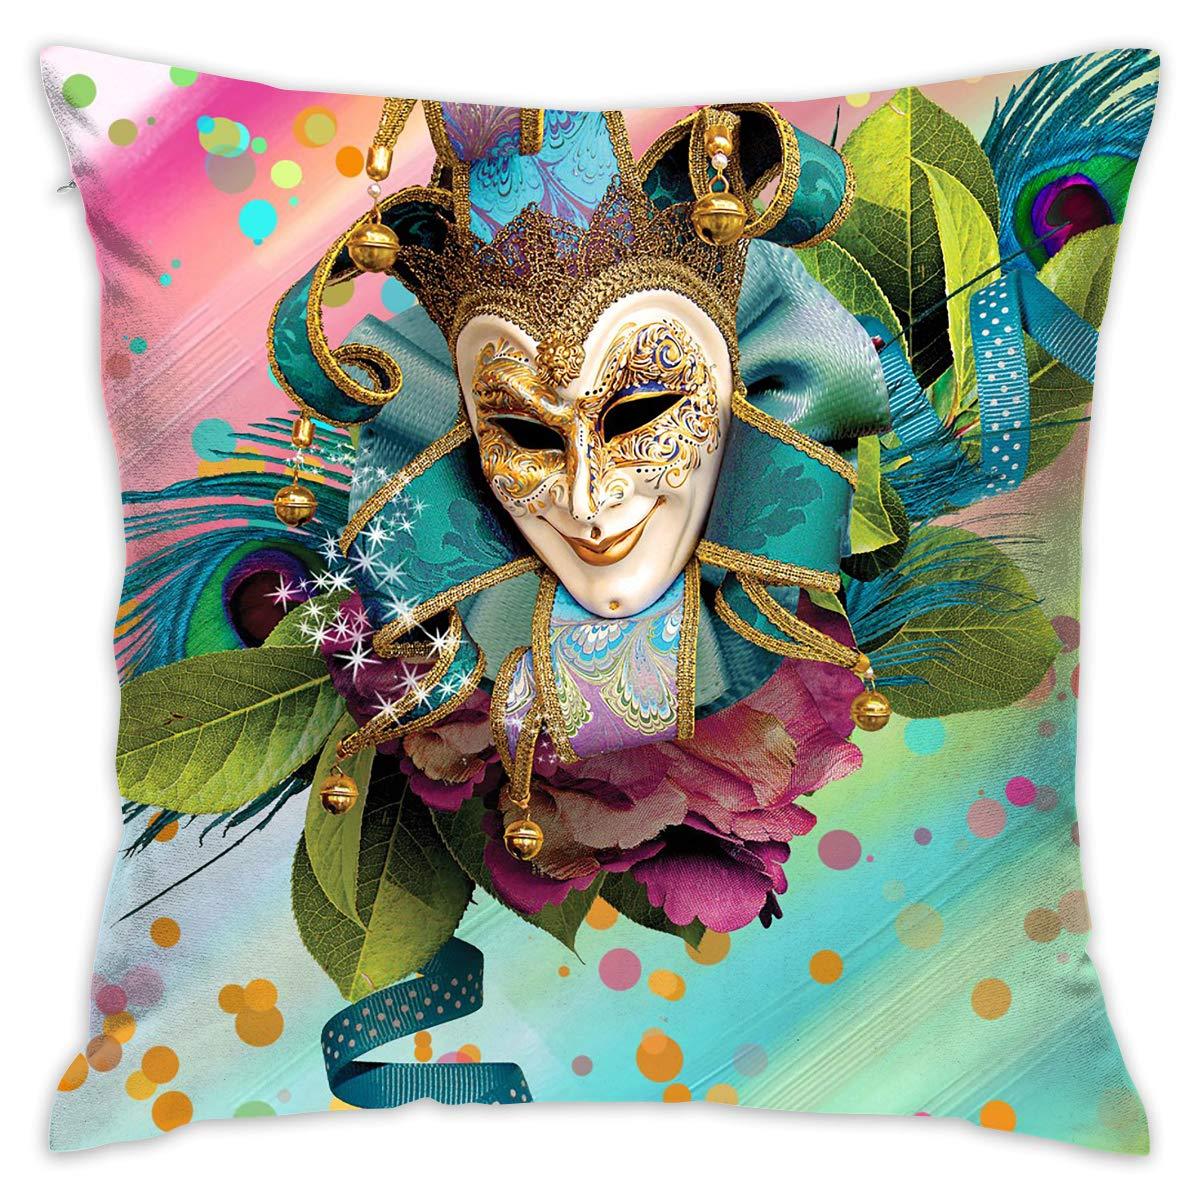 Amazon.com: Redcong Cushion Throw 18